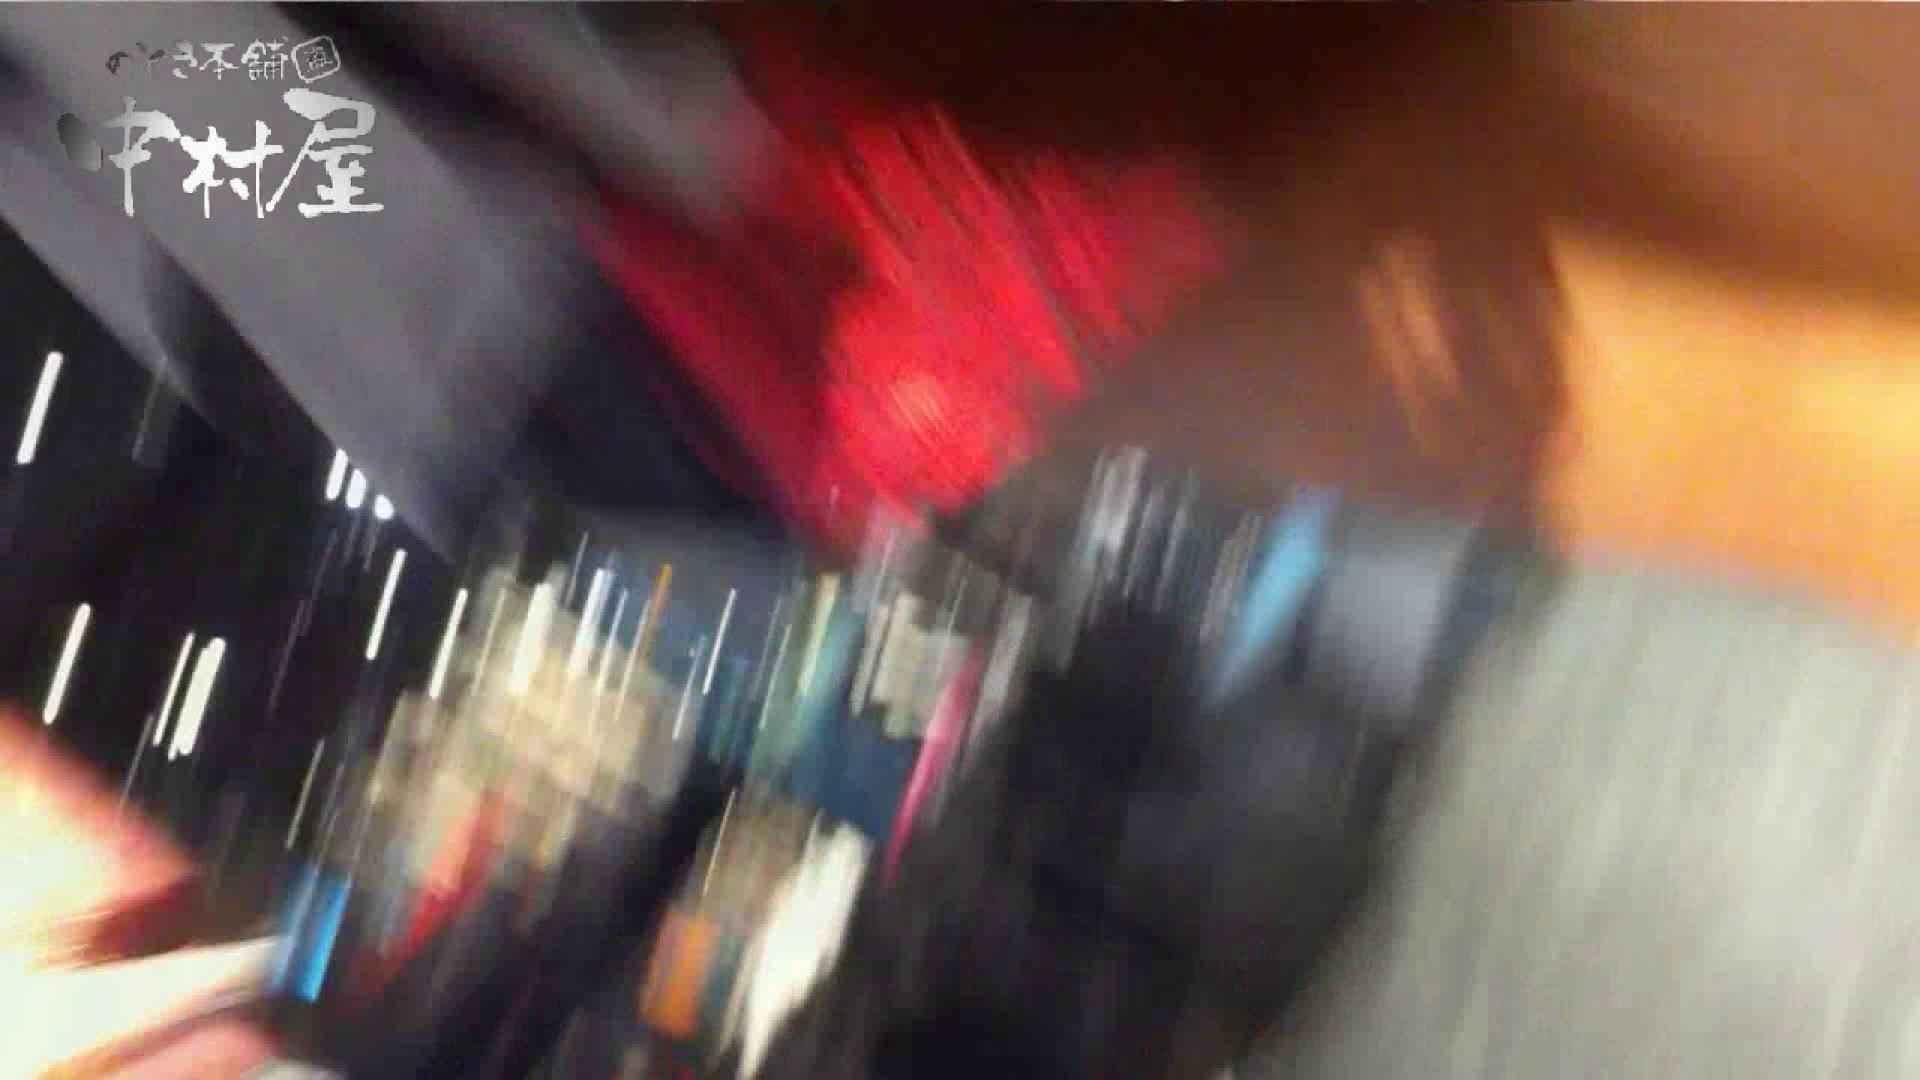 vol.48可愛いカリスマ店員胸チラ&パンチラ アニメ声の店員さん パンチラ | チラ  110画像 91